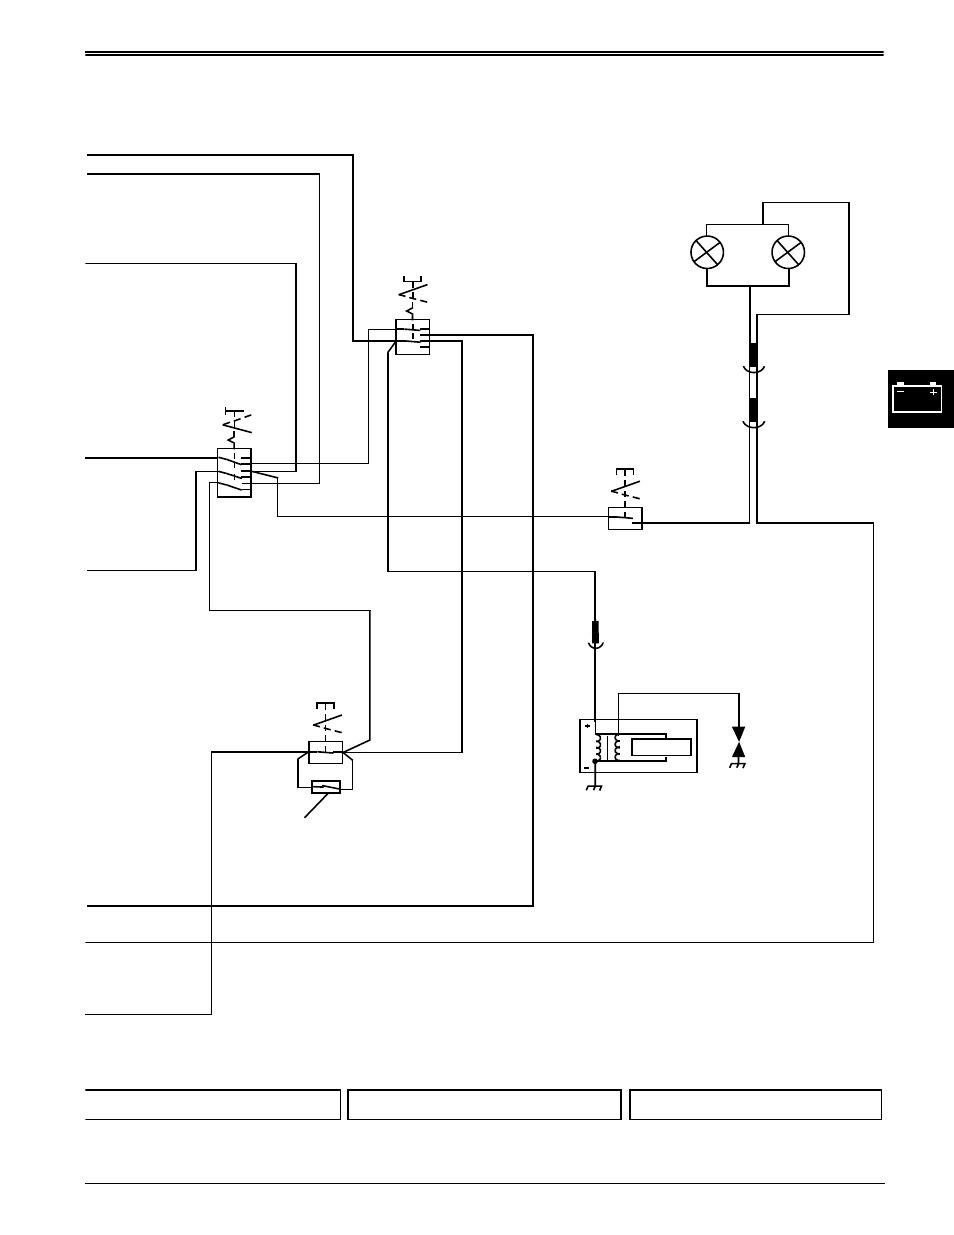 John Deere Stx38 Wiring Schematic. Wiring Schematics John Deere Stx38 User Manual Page 109 314 Rh Manualsdir Electrical Schematic. John Deere. John Deere 185 Schematic Electric At Scoala.co